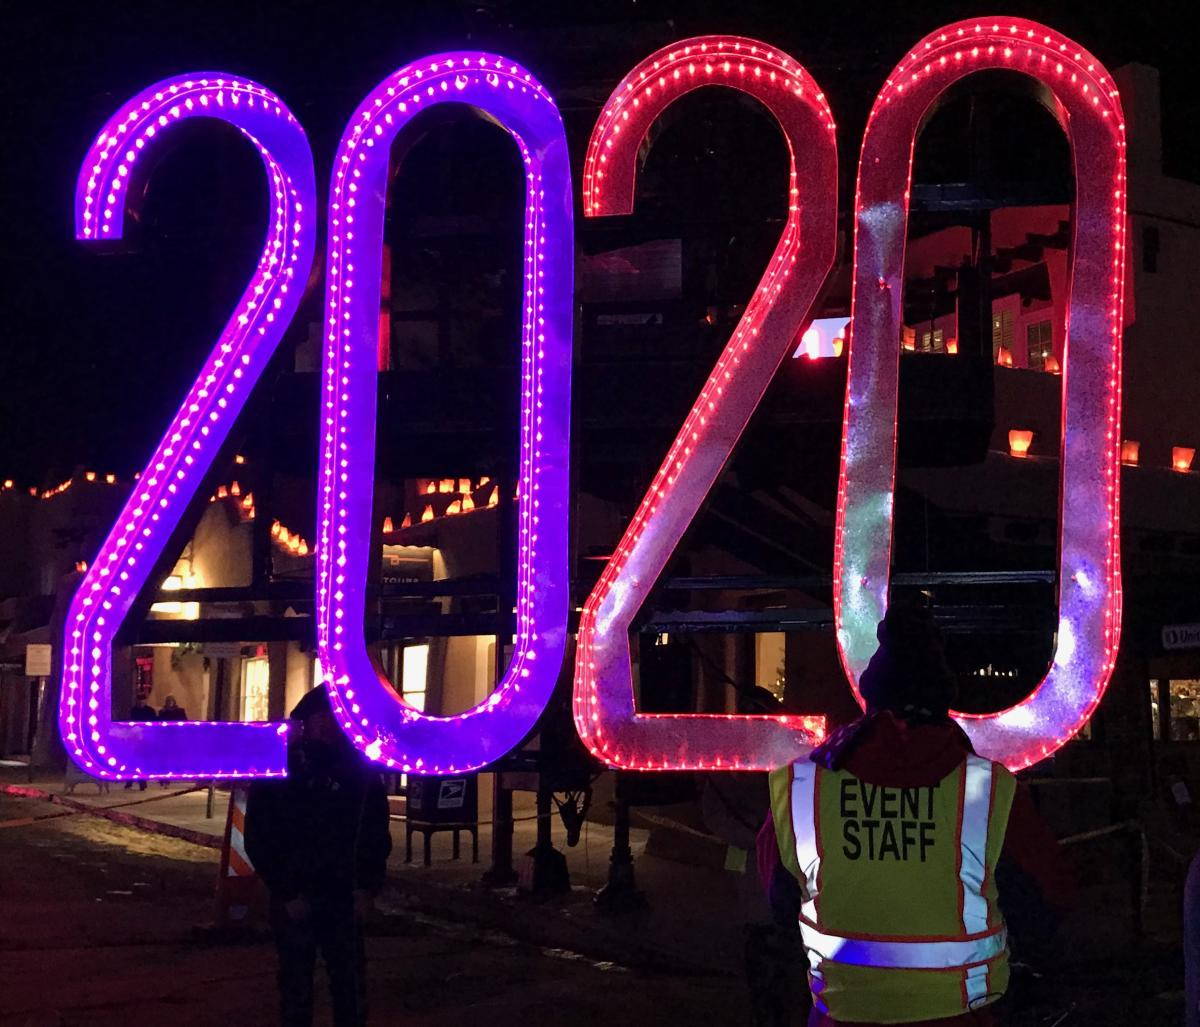 La Fonda New Year's Eve